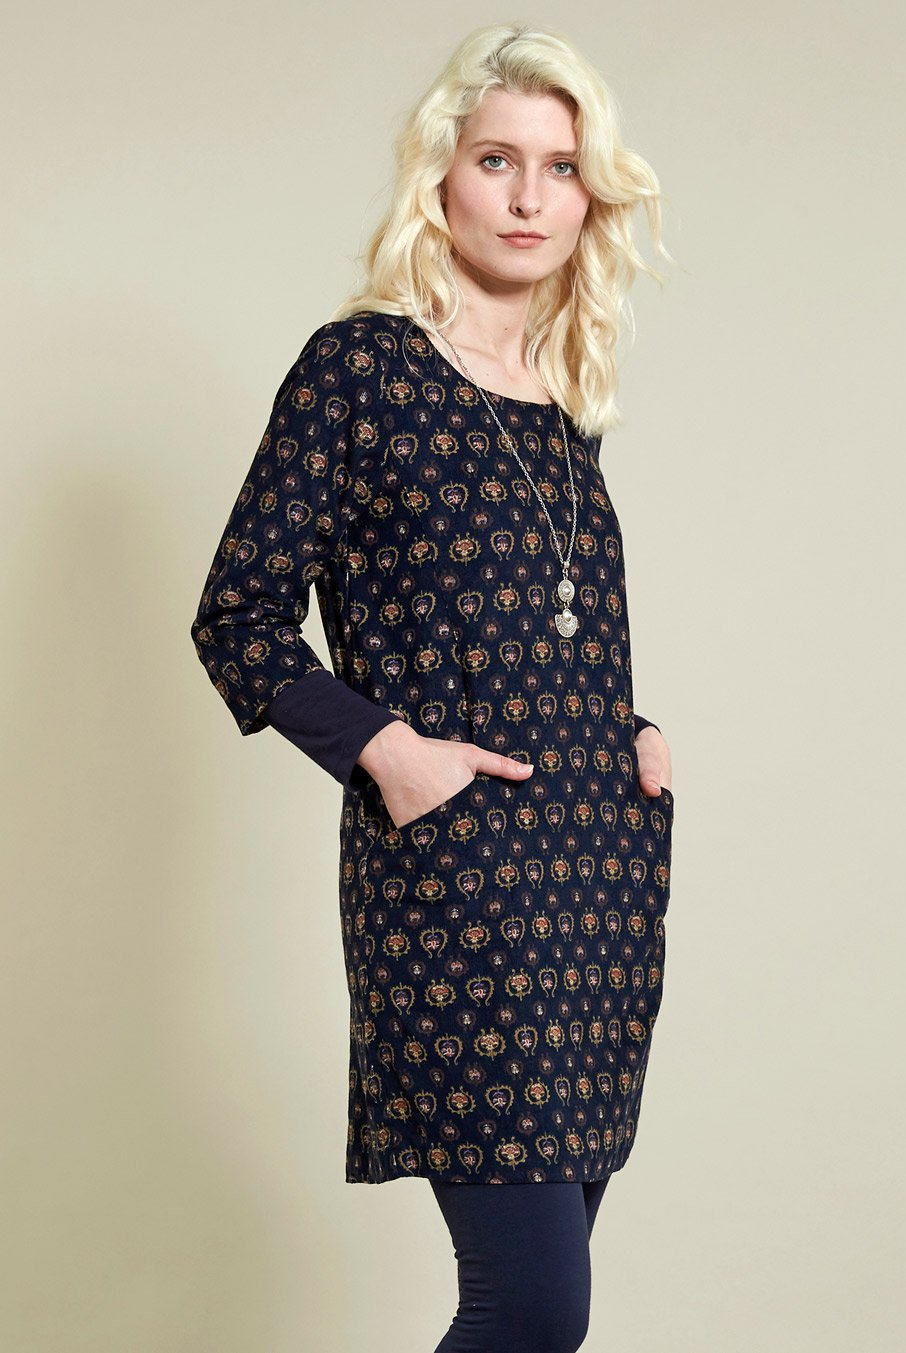 Manšestrové tunikové šaty Folk modré ⋆ Green butik bb152a9b4a